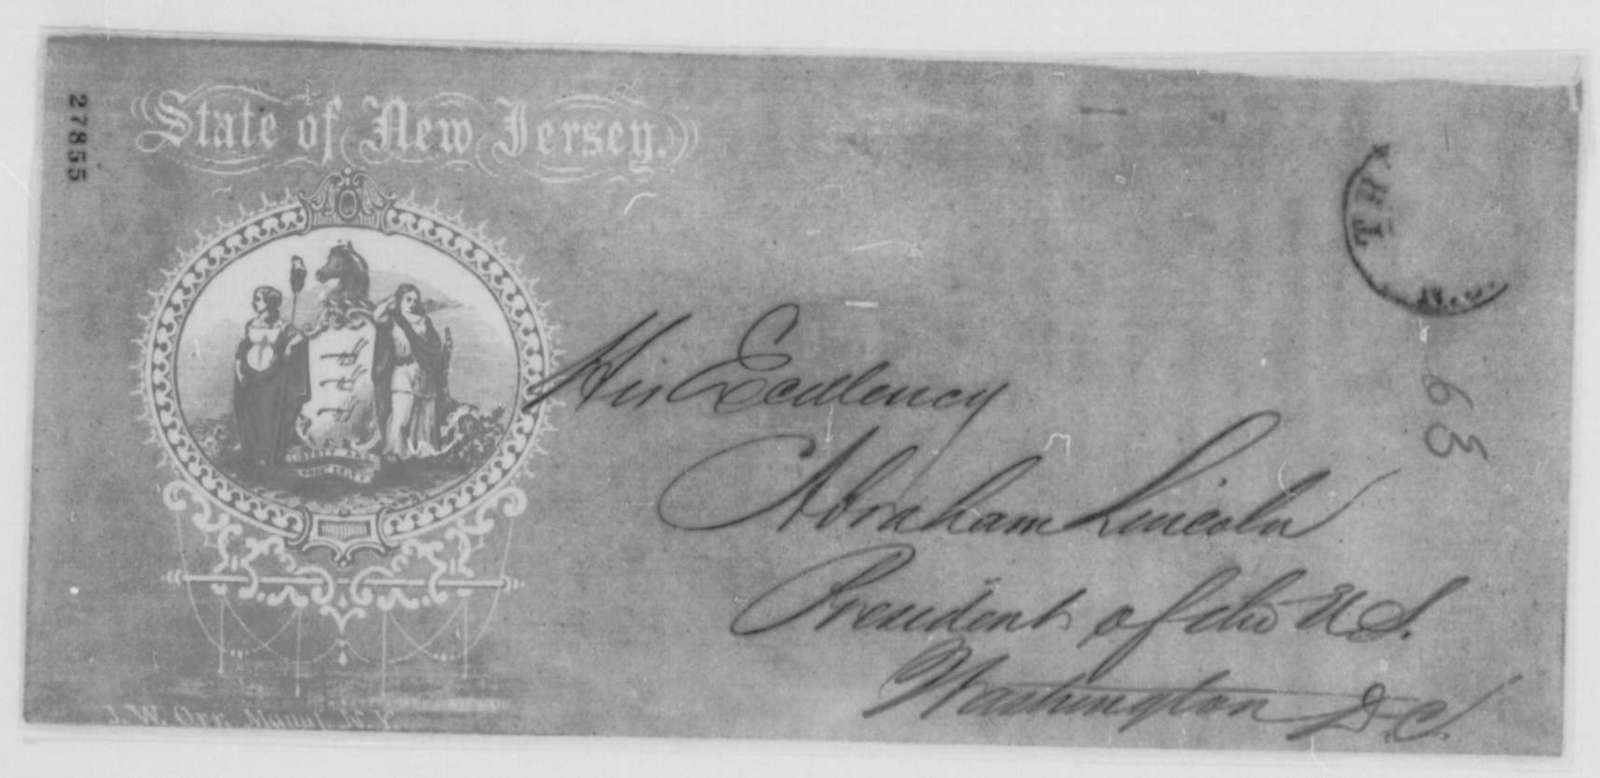 Joel Parker to Abraham Lincoln, Thursday, November 05, 1863  (Recruitment in New Jersey)